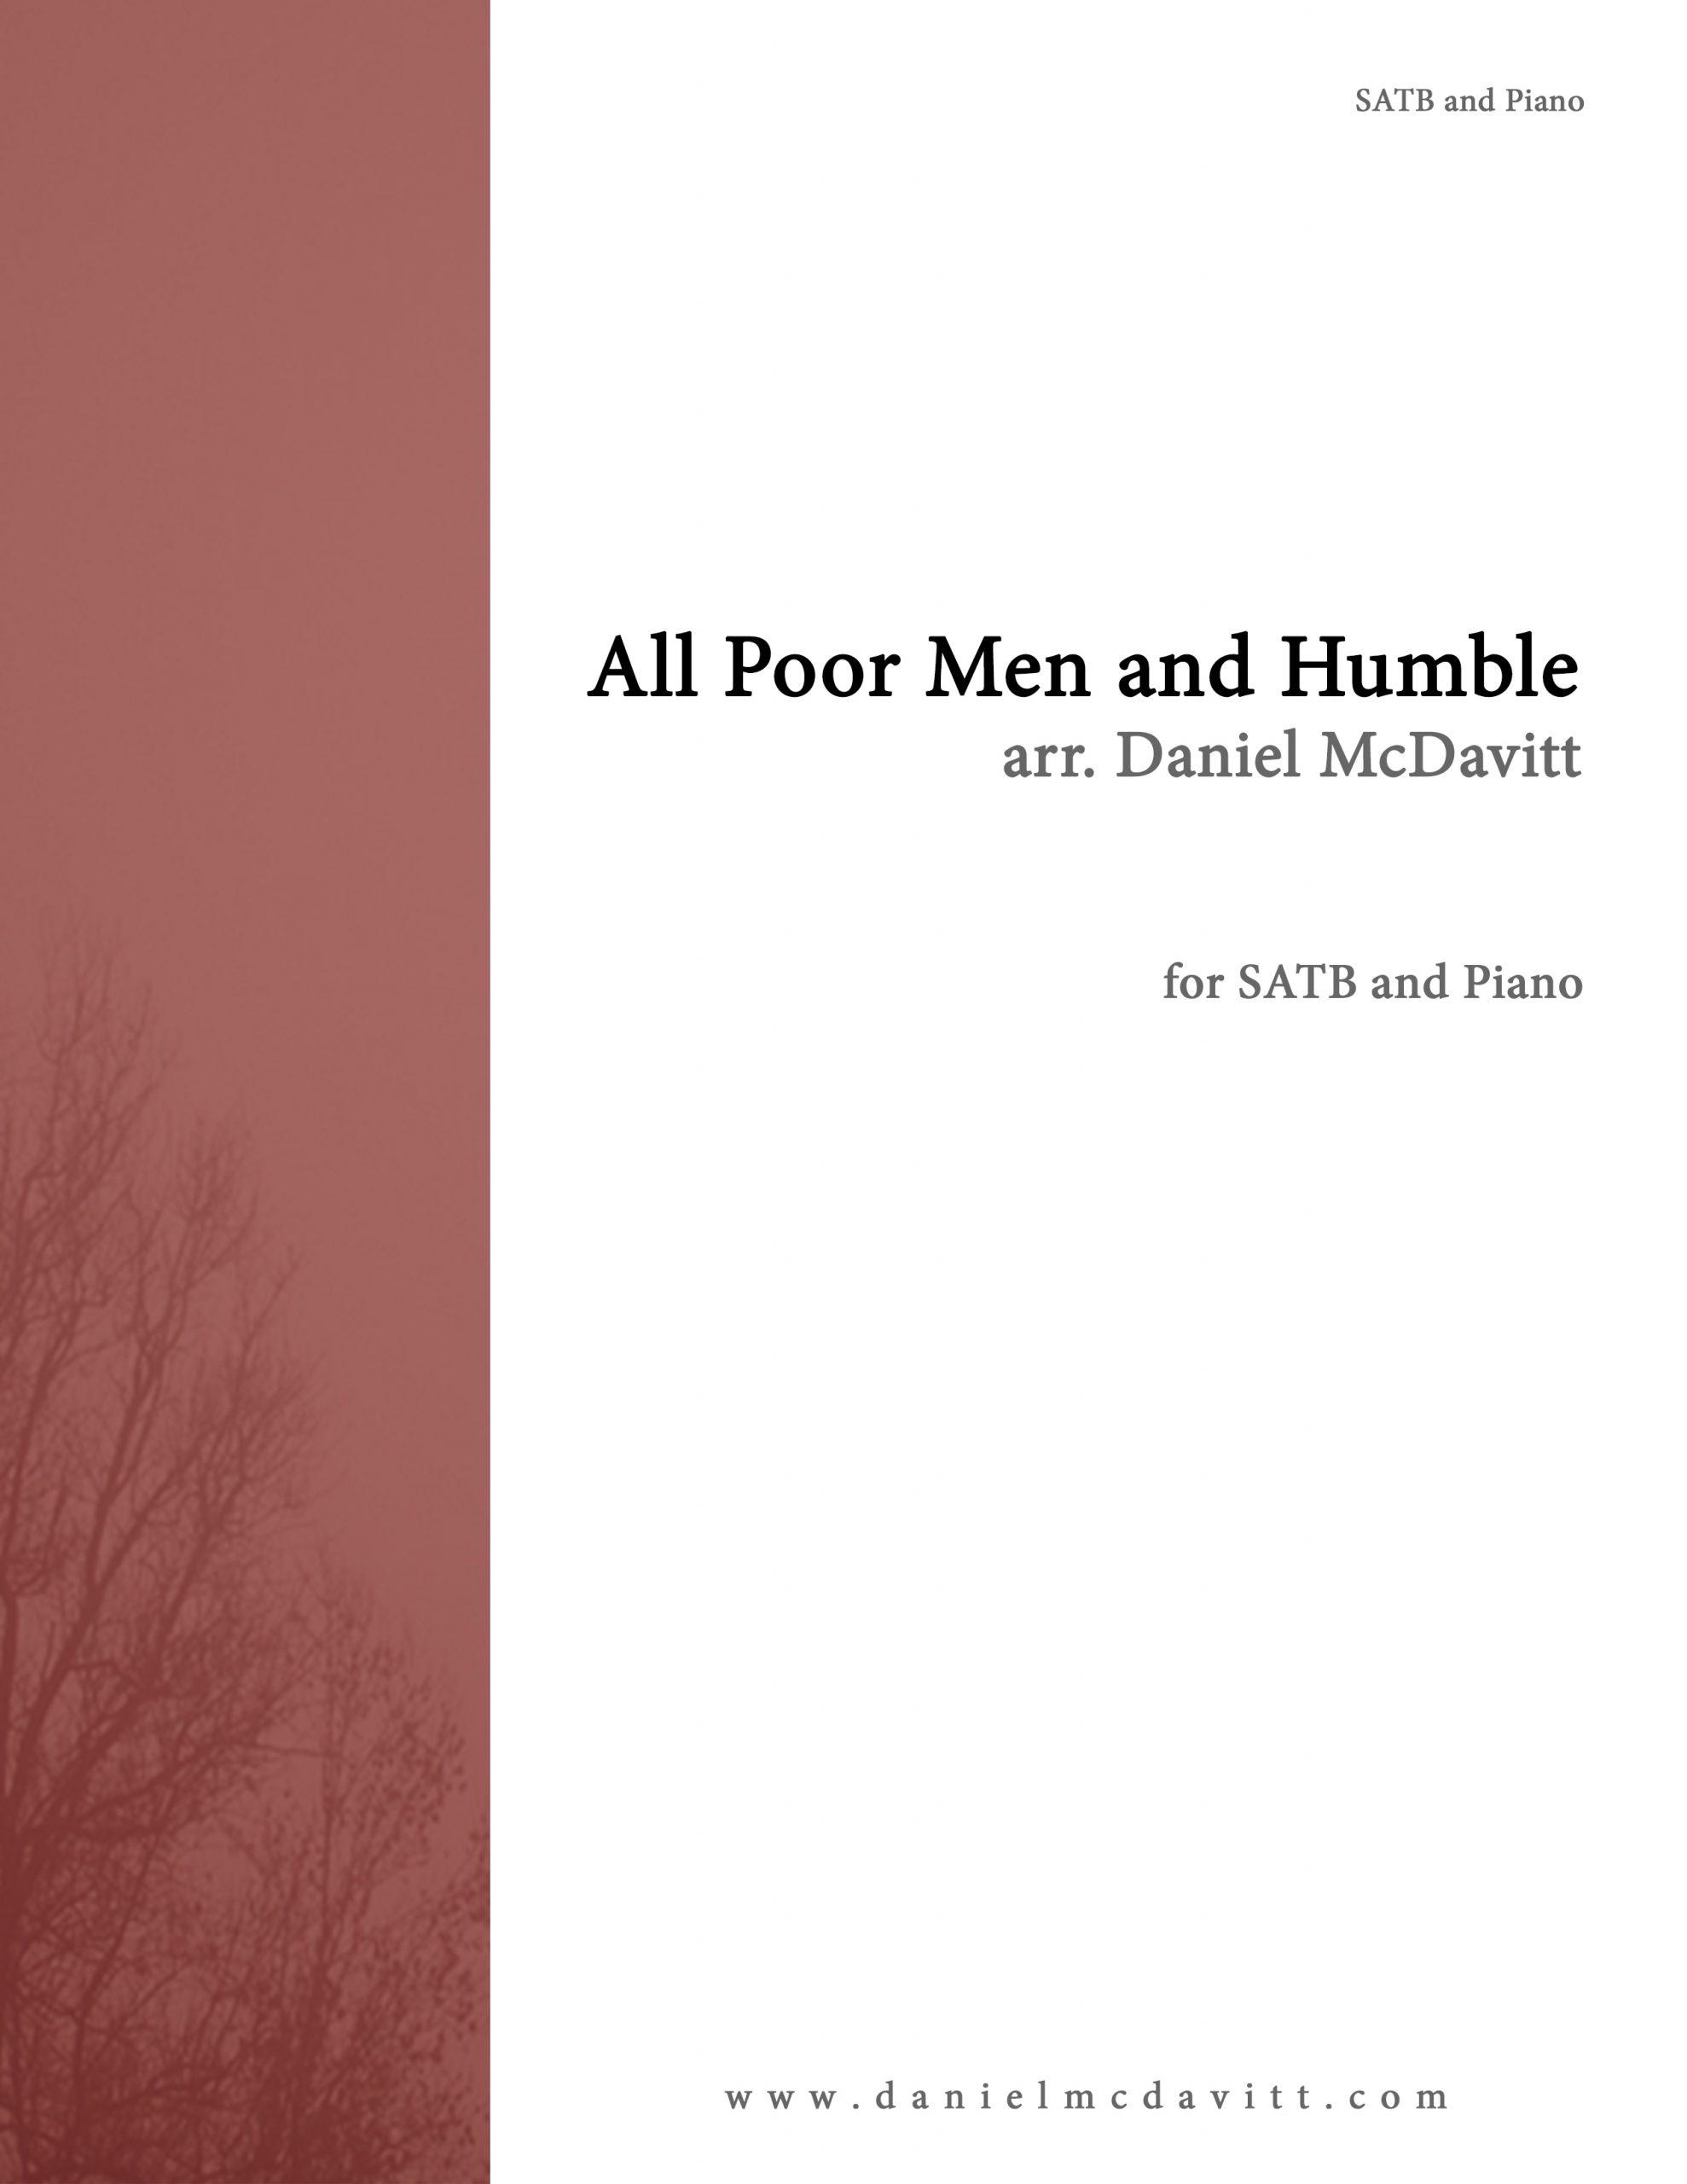 All Poor Men Cover